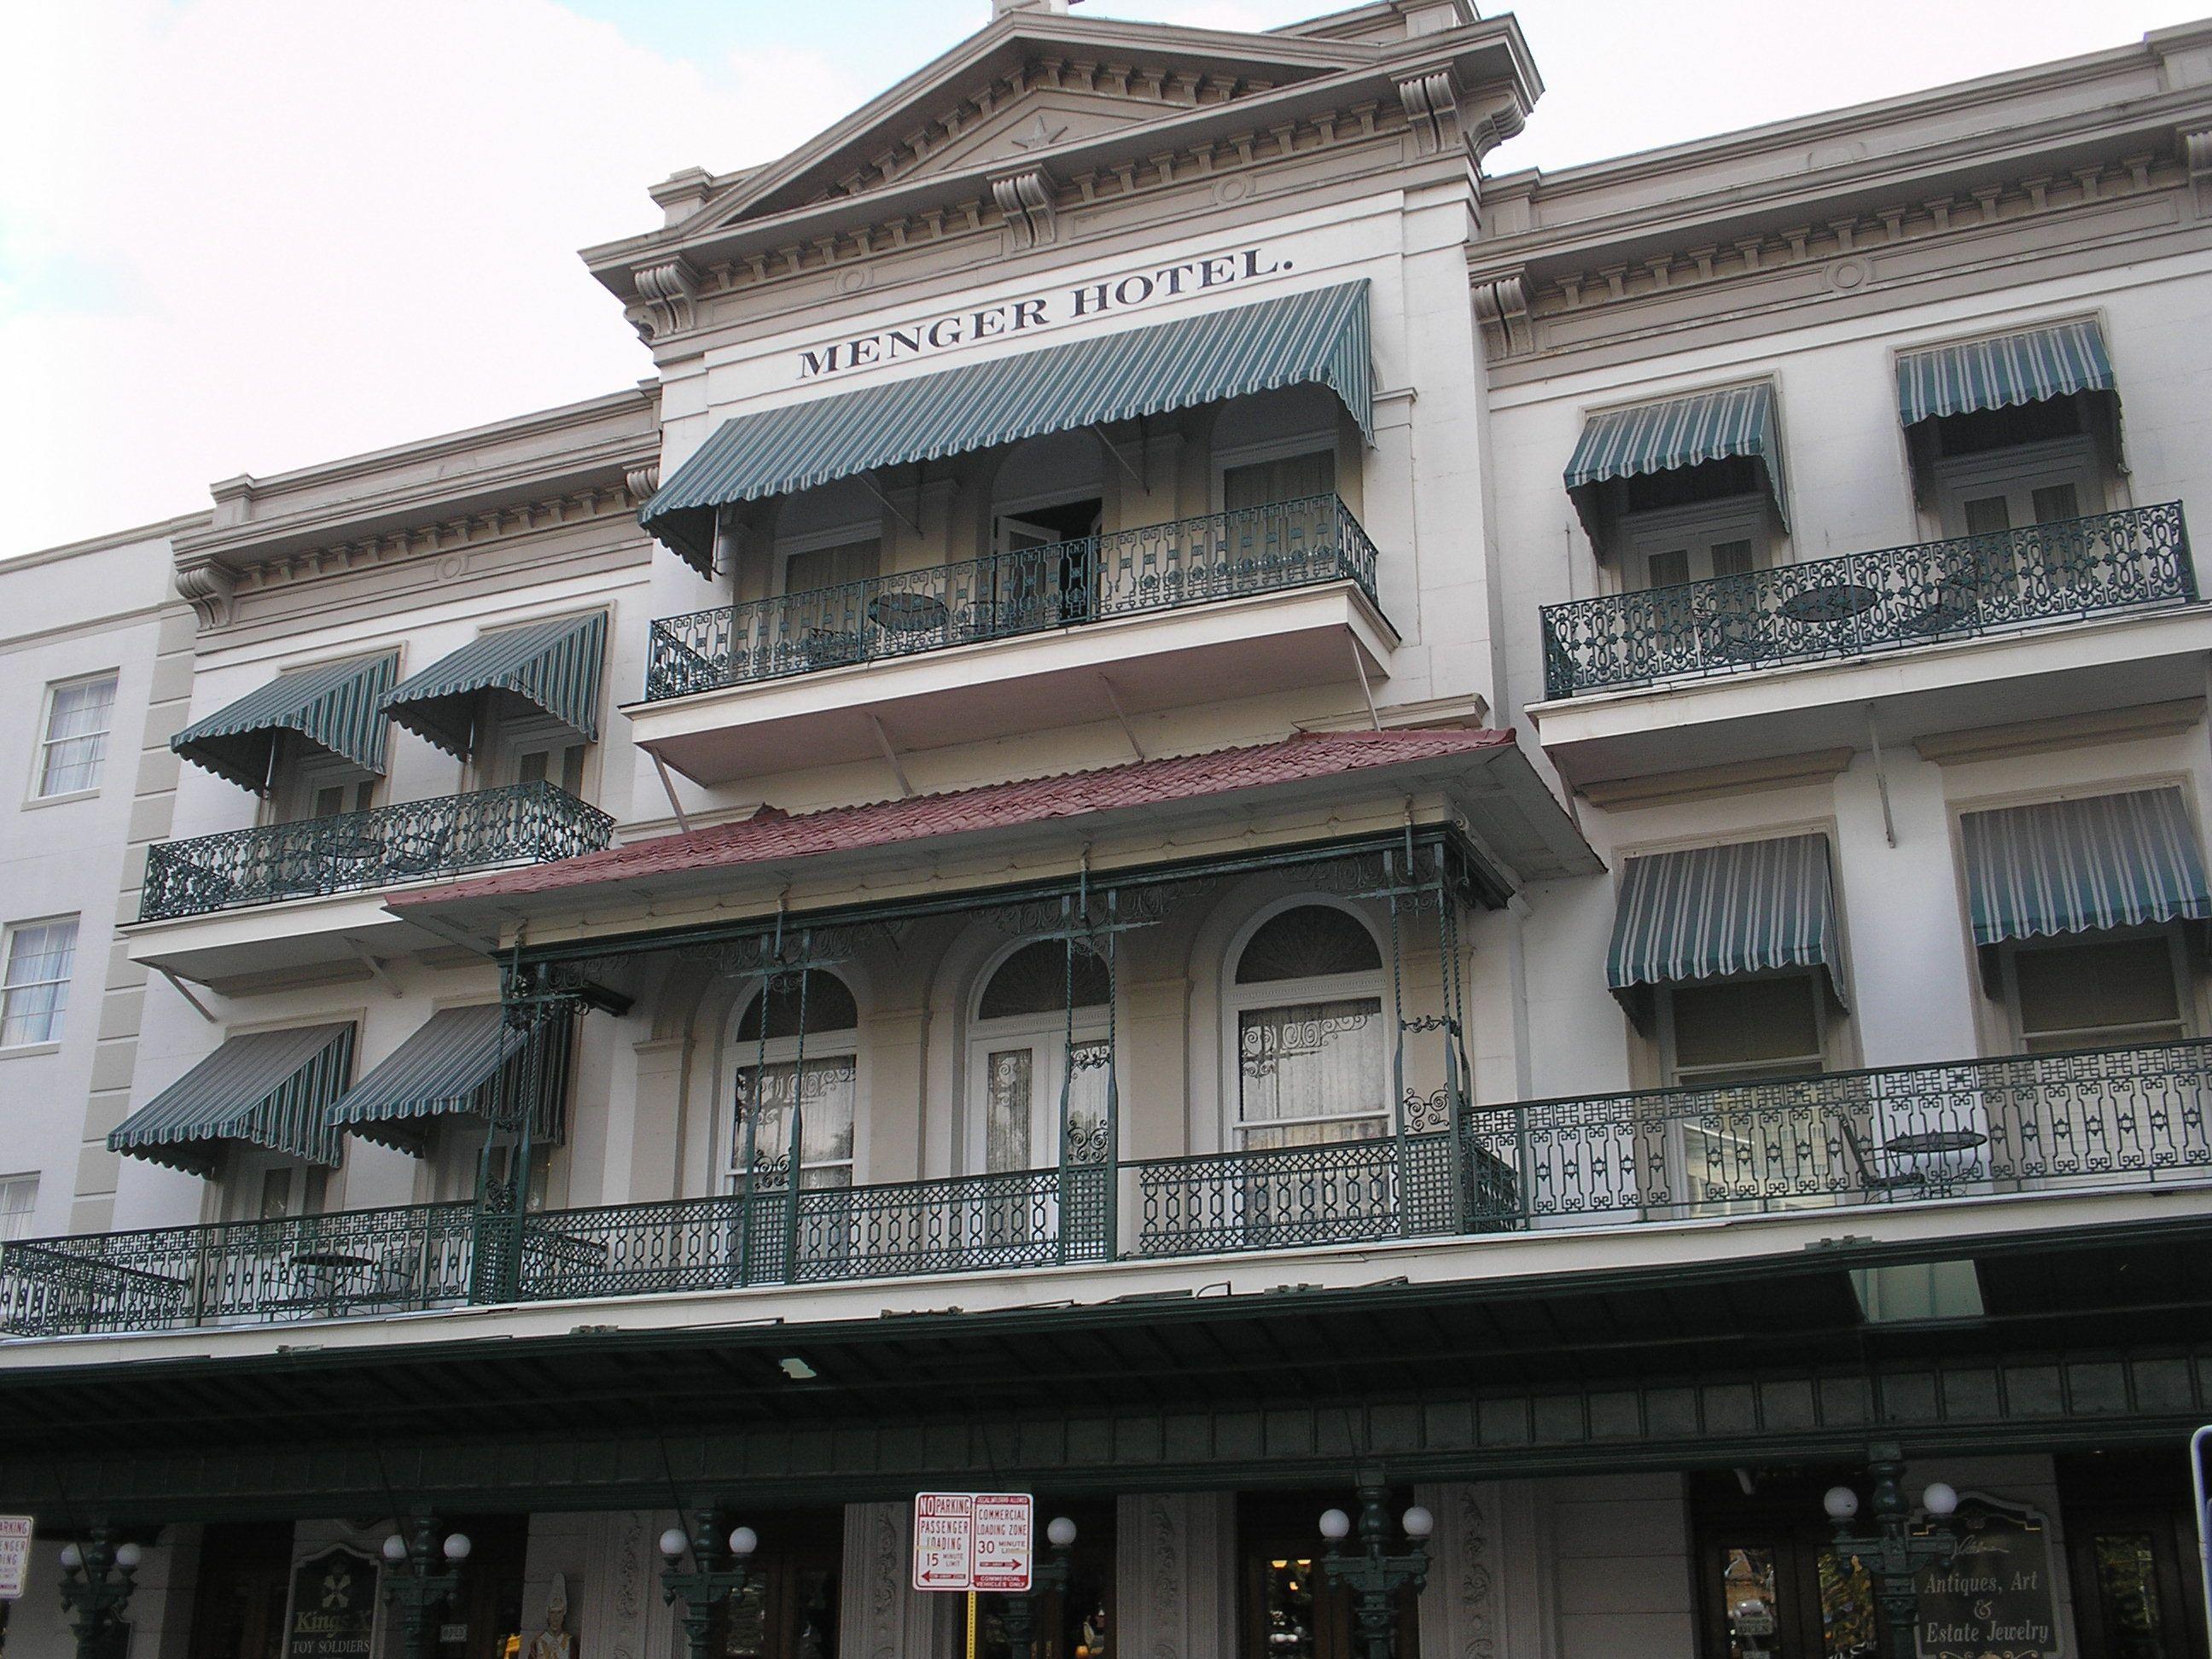 Menger Hotel San Antonio Texas Teddy Roosevelt Who Recruited Cowboys Fresh Off